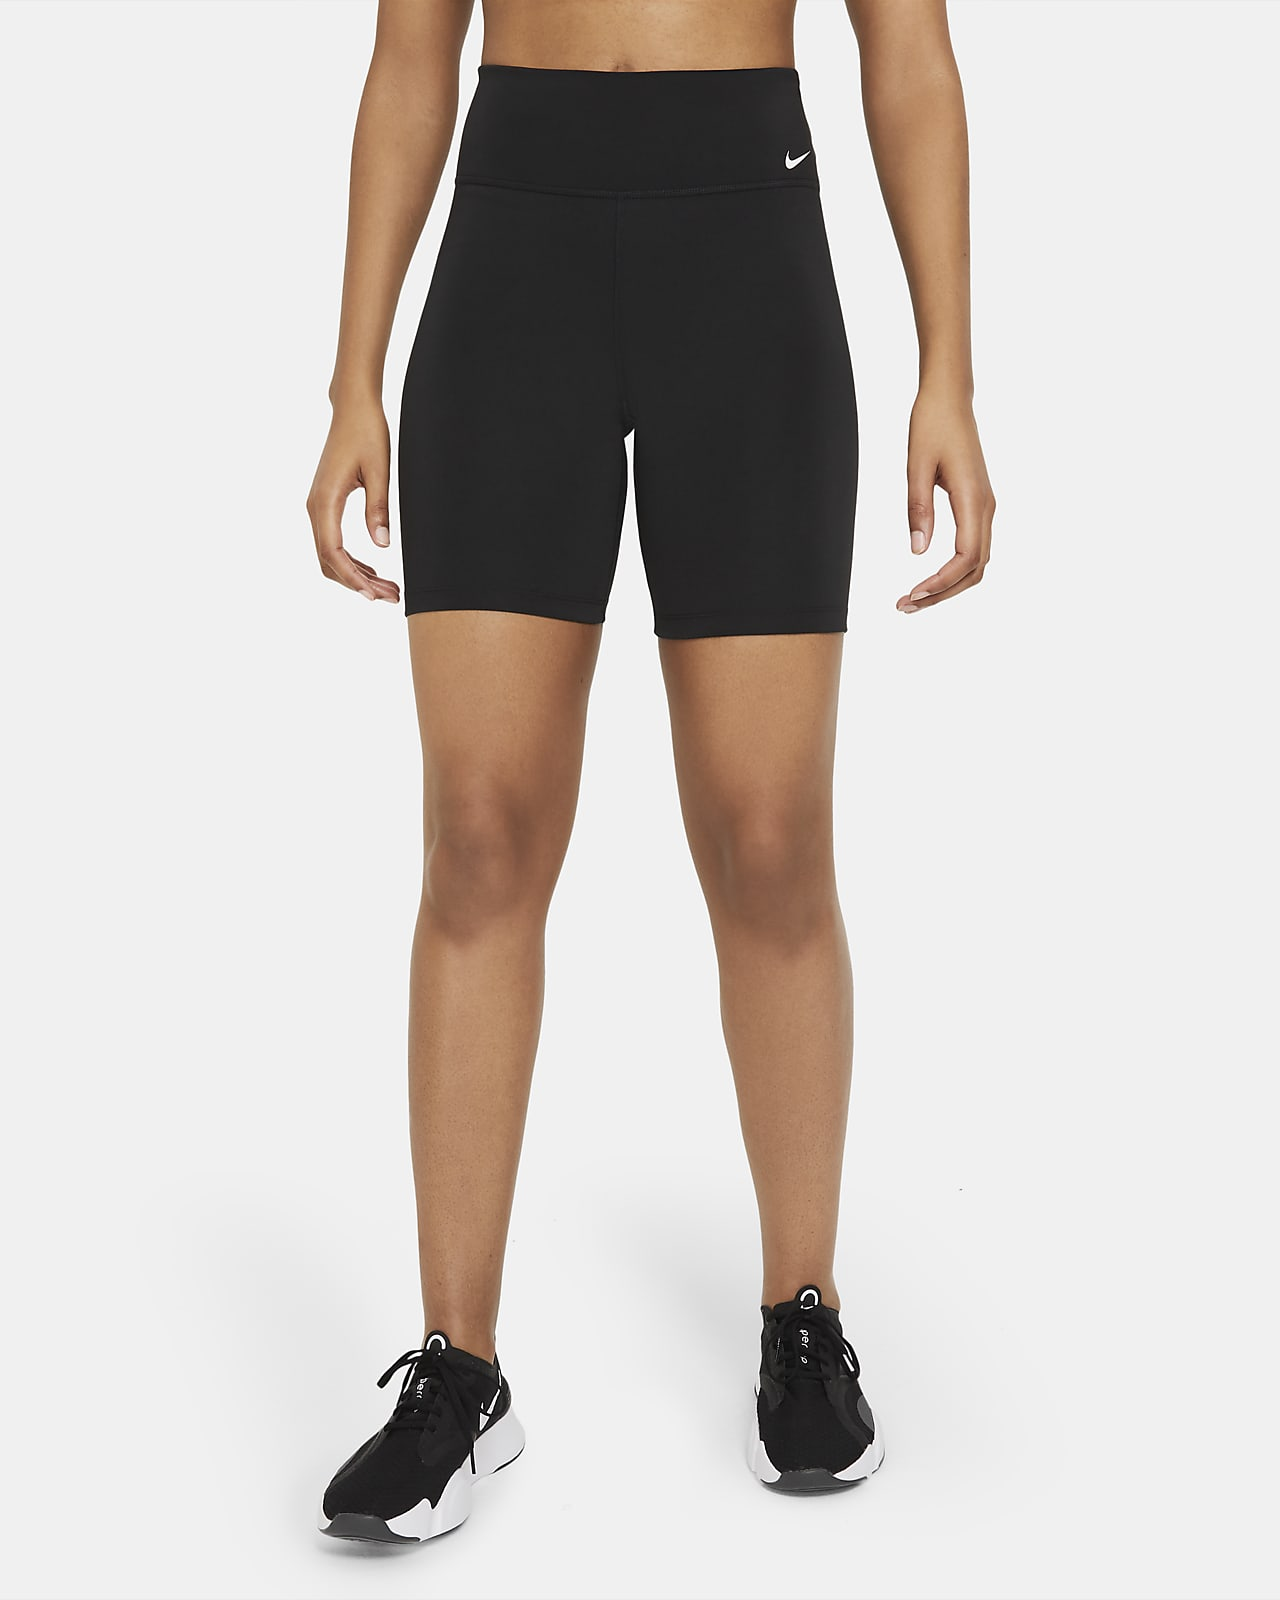 Nike One Pantalón corto de ciclismo de talle medio de 18 cm - Mujer